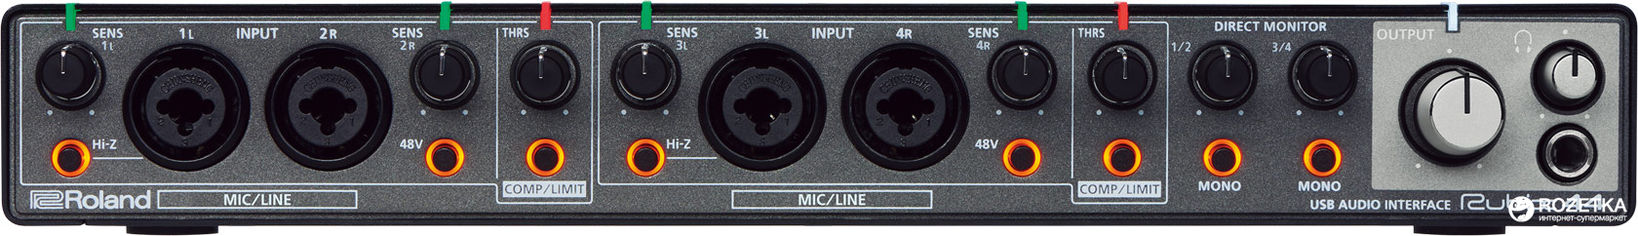 Аудиоинтерфейс Roland Rubix44 от Rozetka